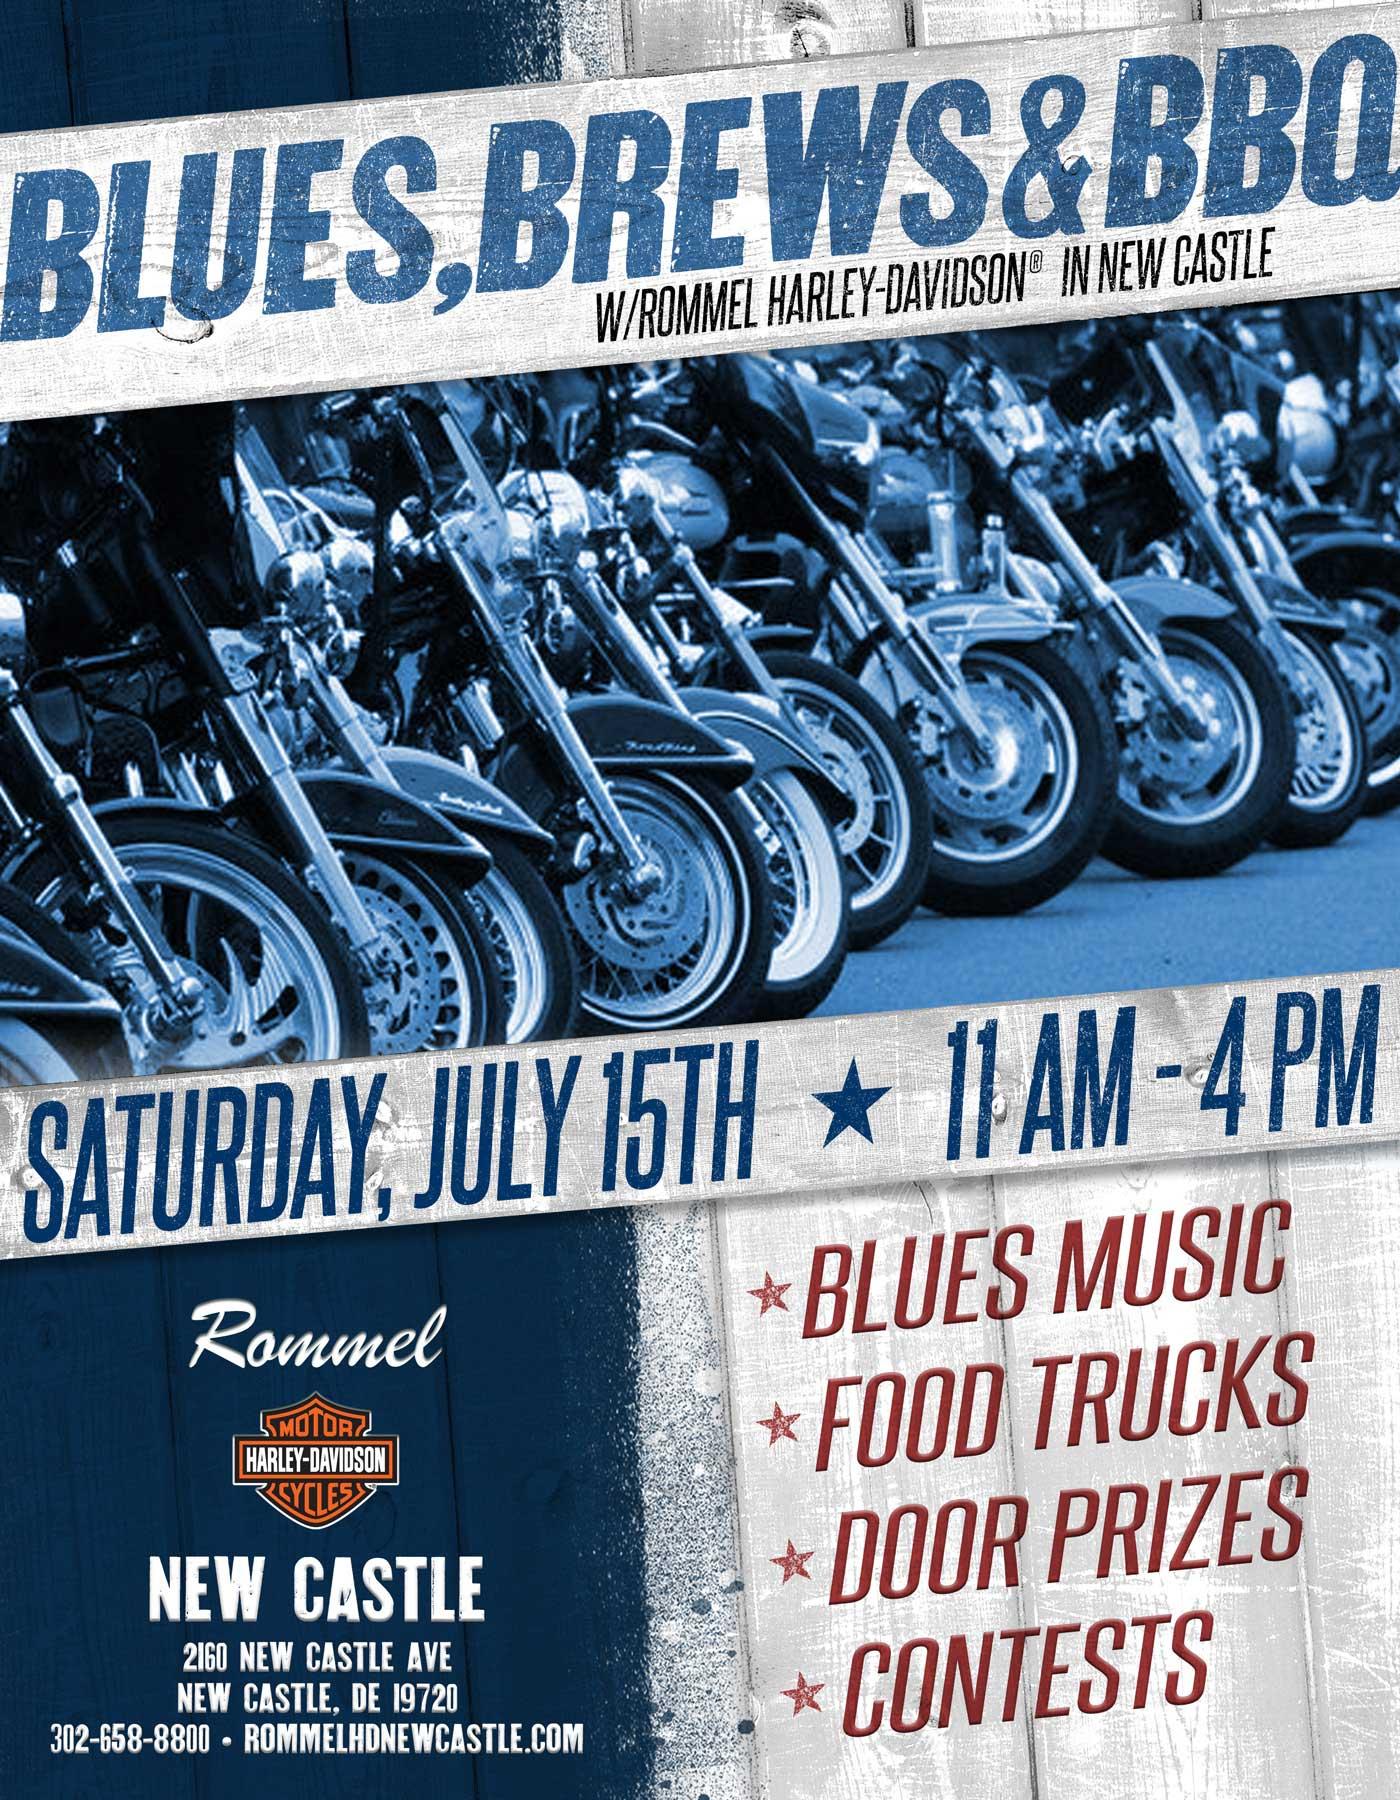 Blues, Brews & BBQ @ New Castle